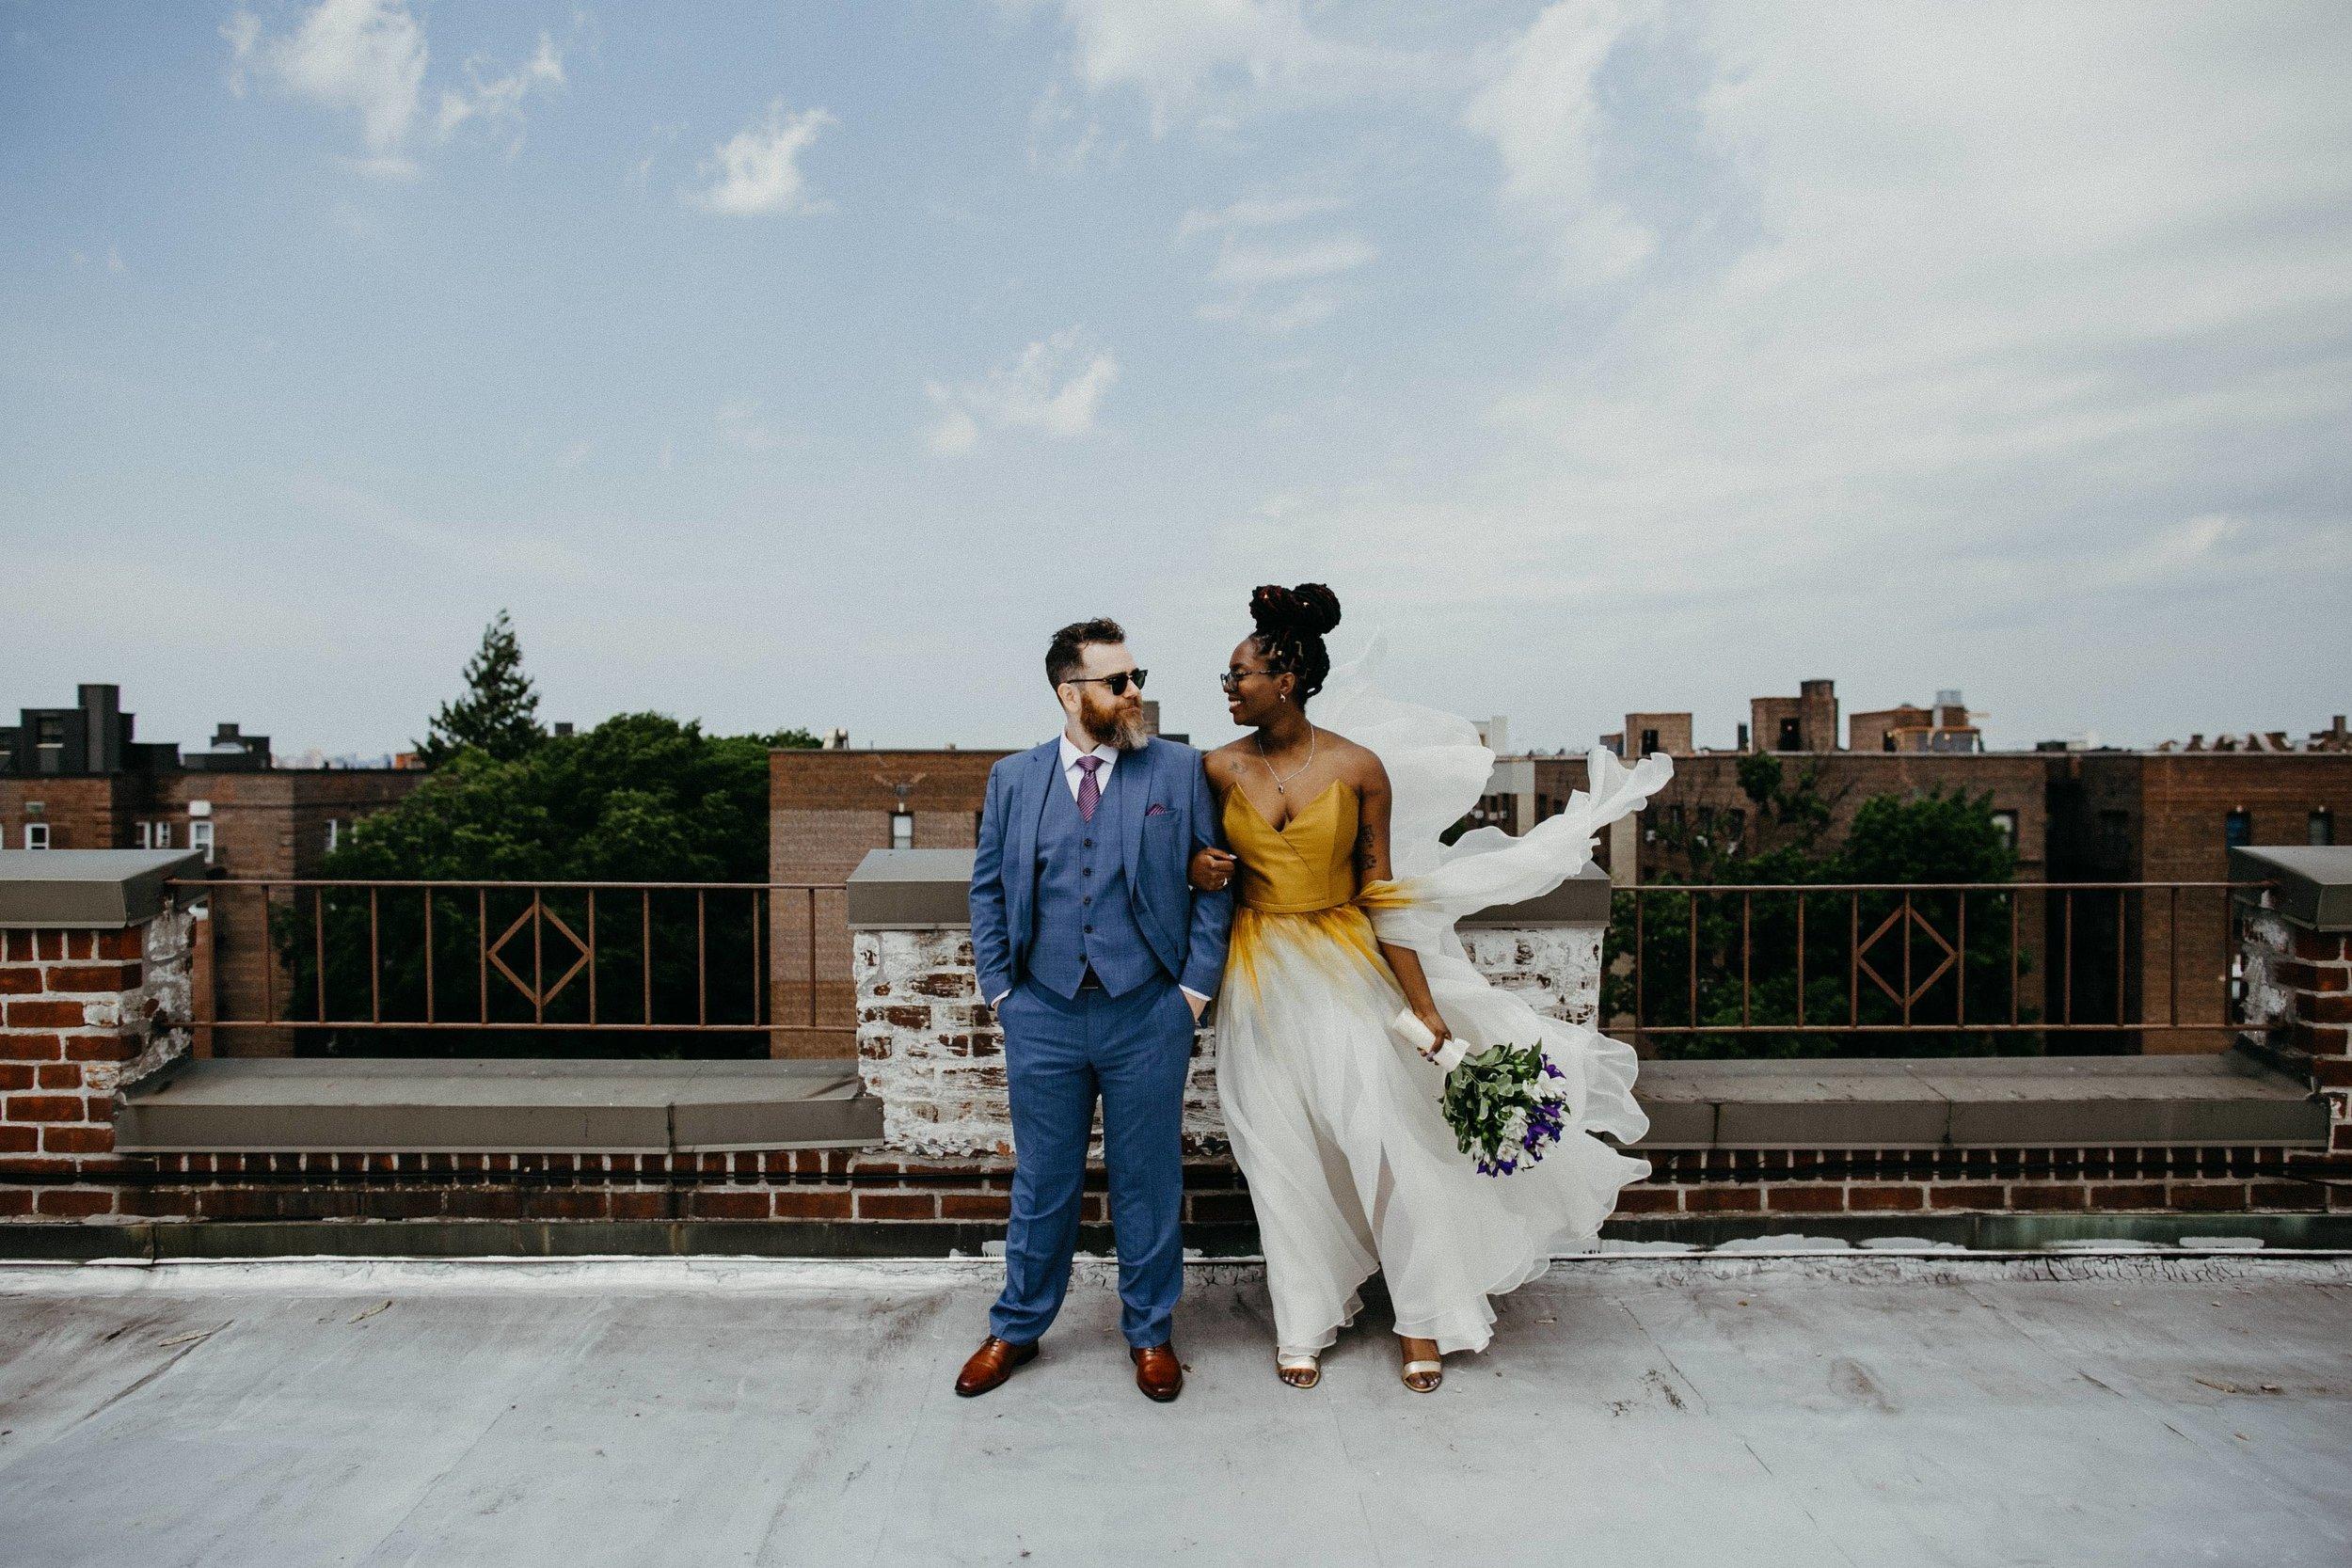 Sevlynn-Photography-Wedding-LIC-Landing-Maiella-NYC-13.jpg